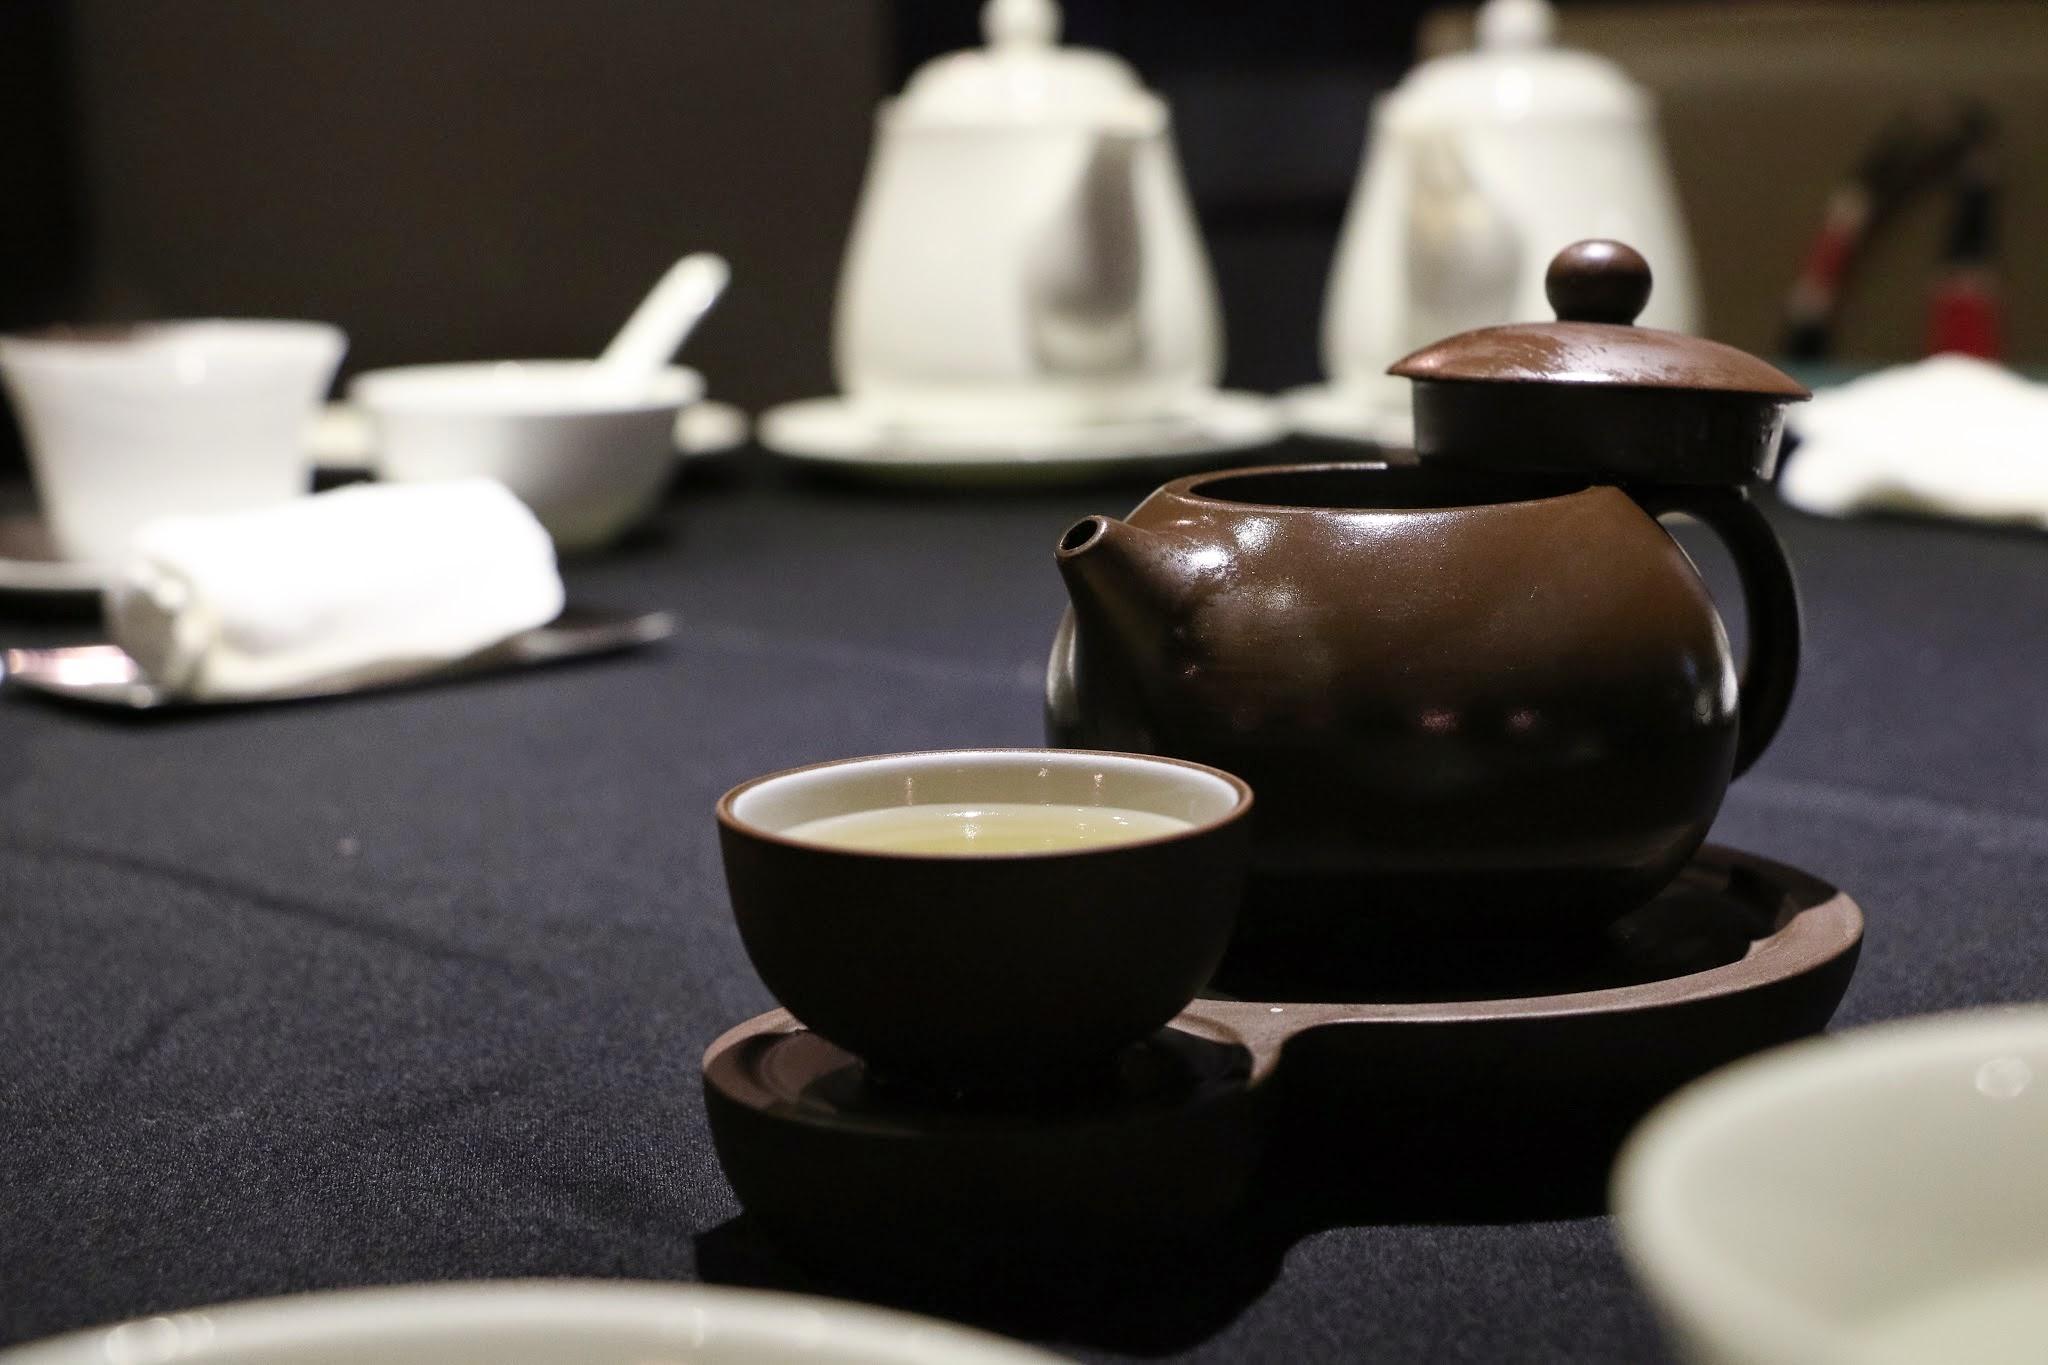 Shanghai Lo, Crab Kitchen, Crab Soup Teapot